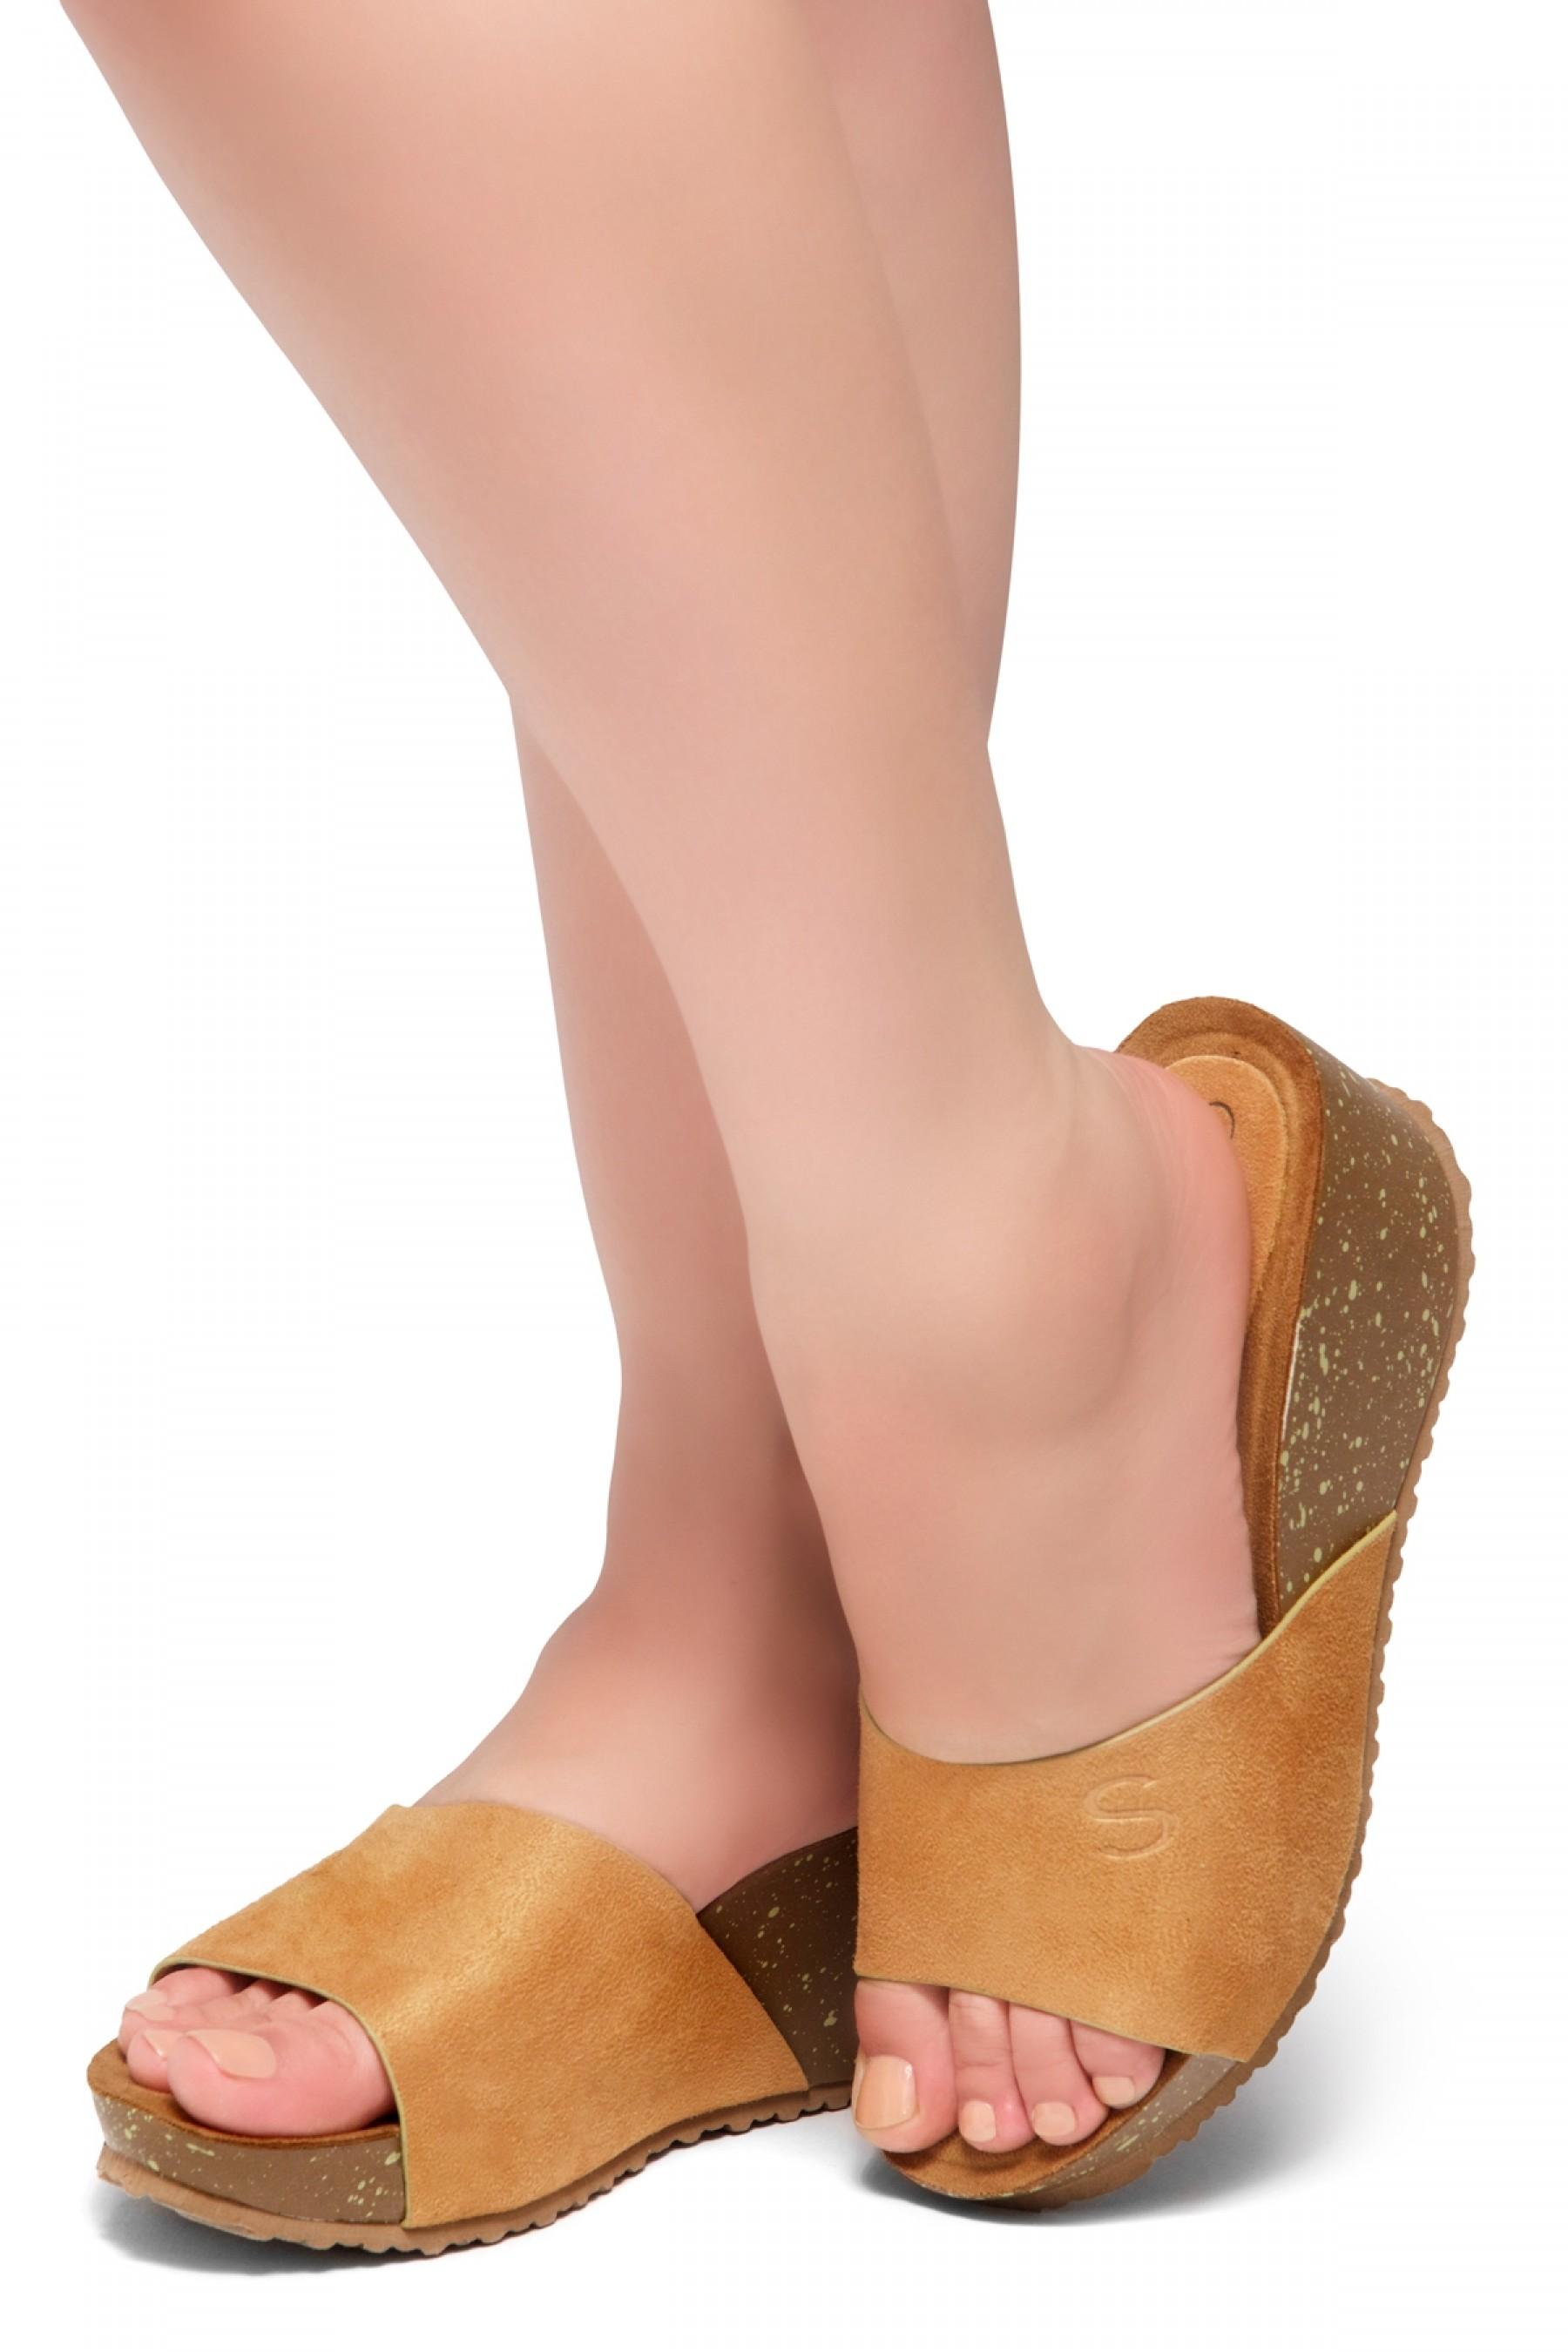 HerStyle Alessia -Open Toe Slide Wedge Sandals (Mustard)